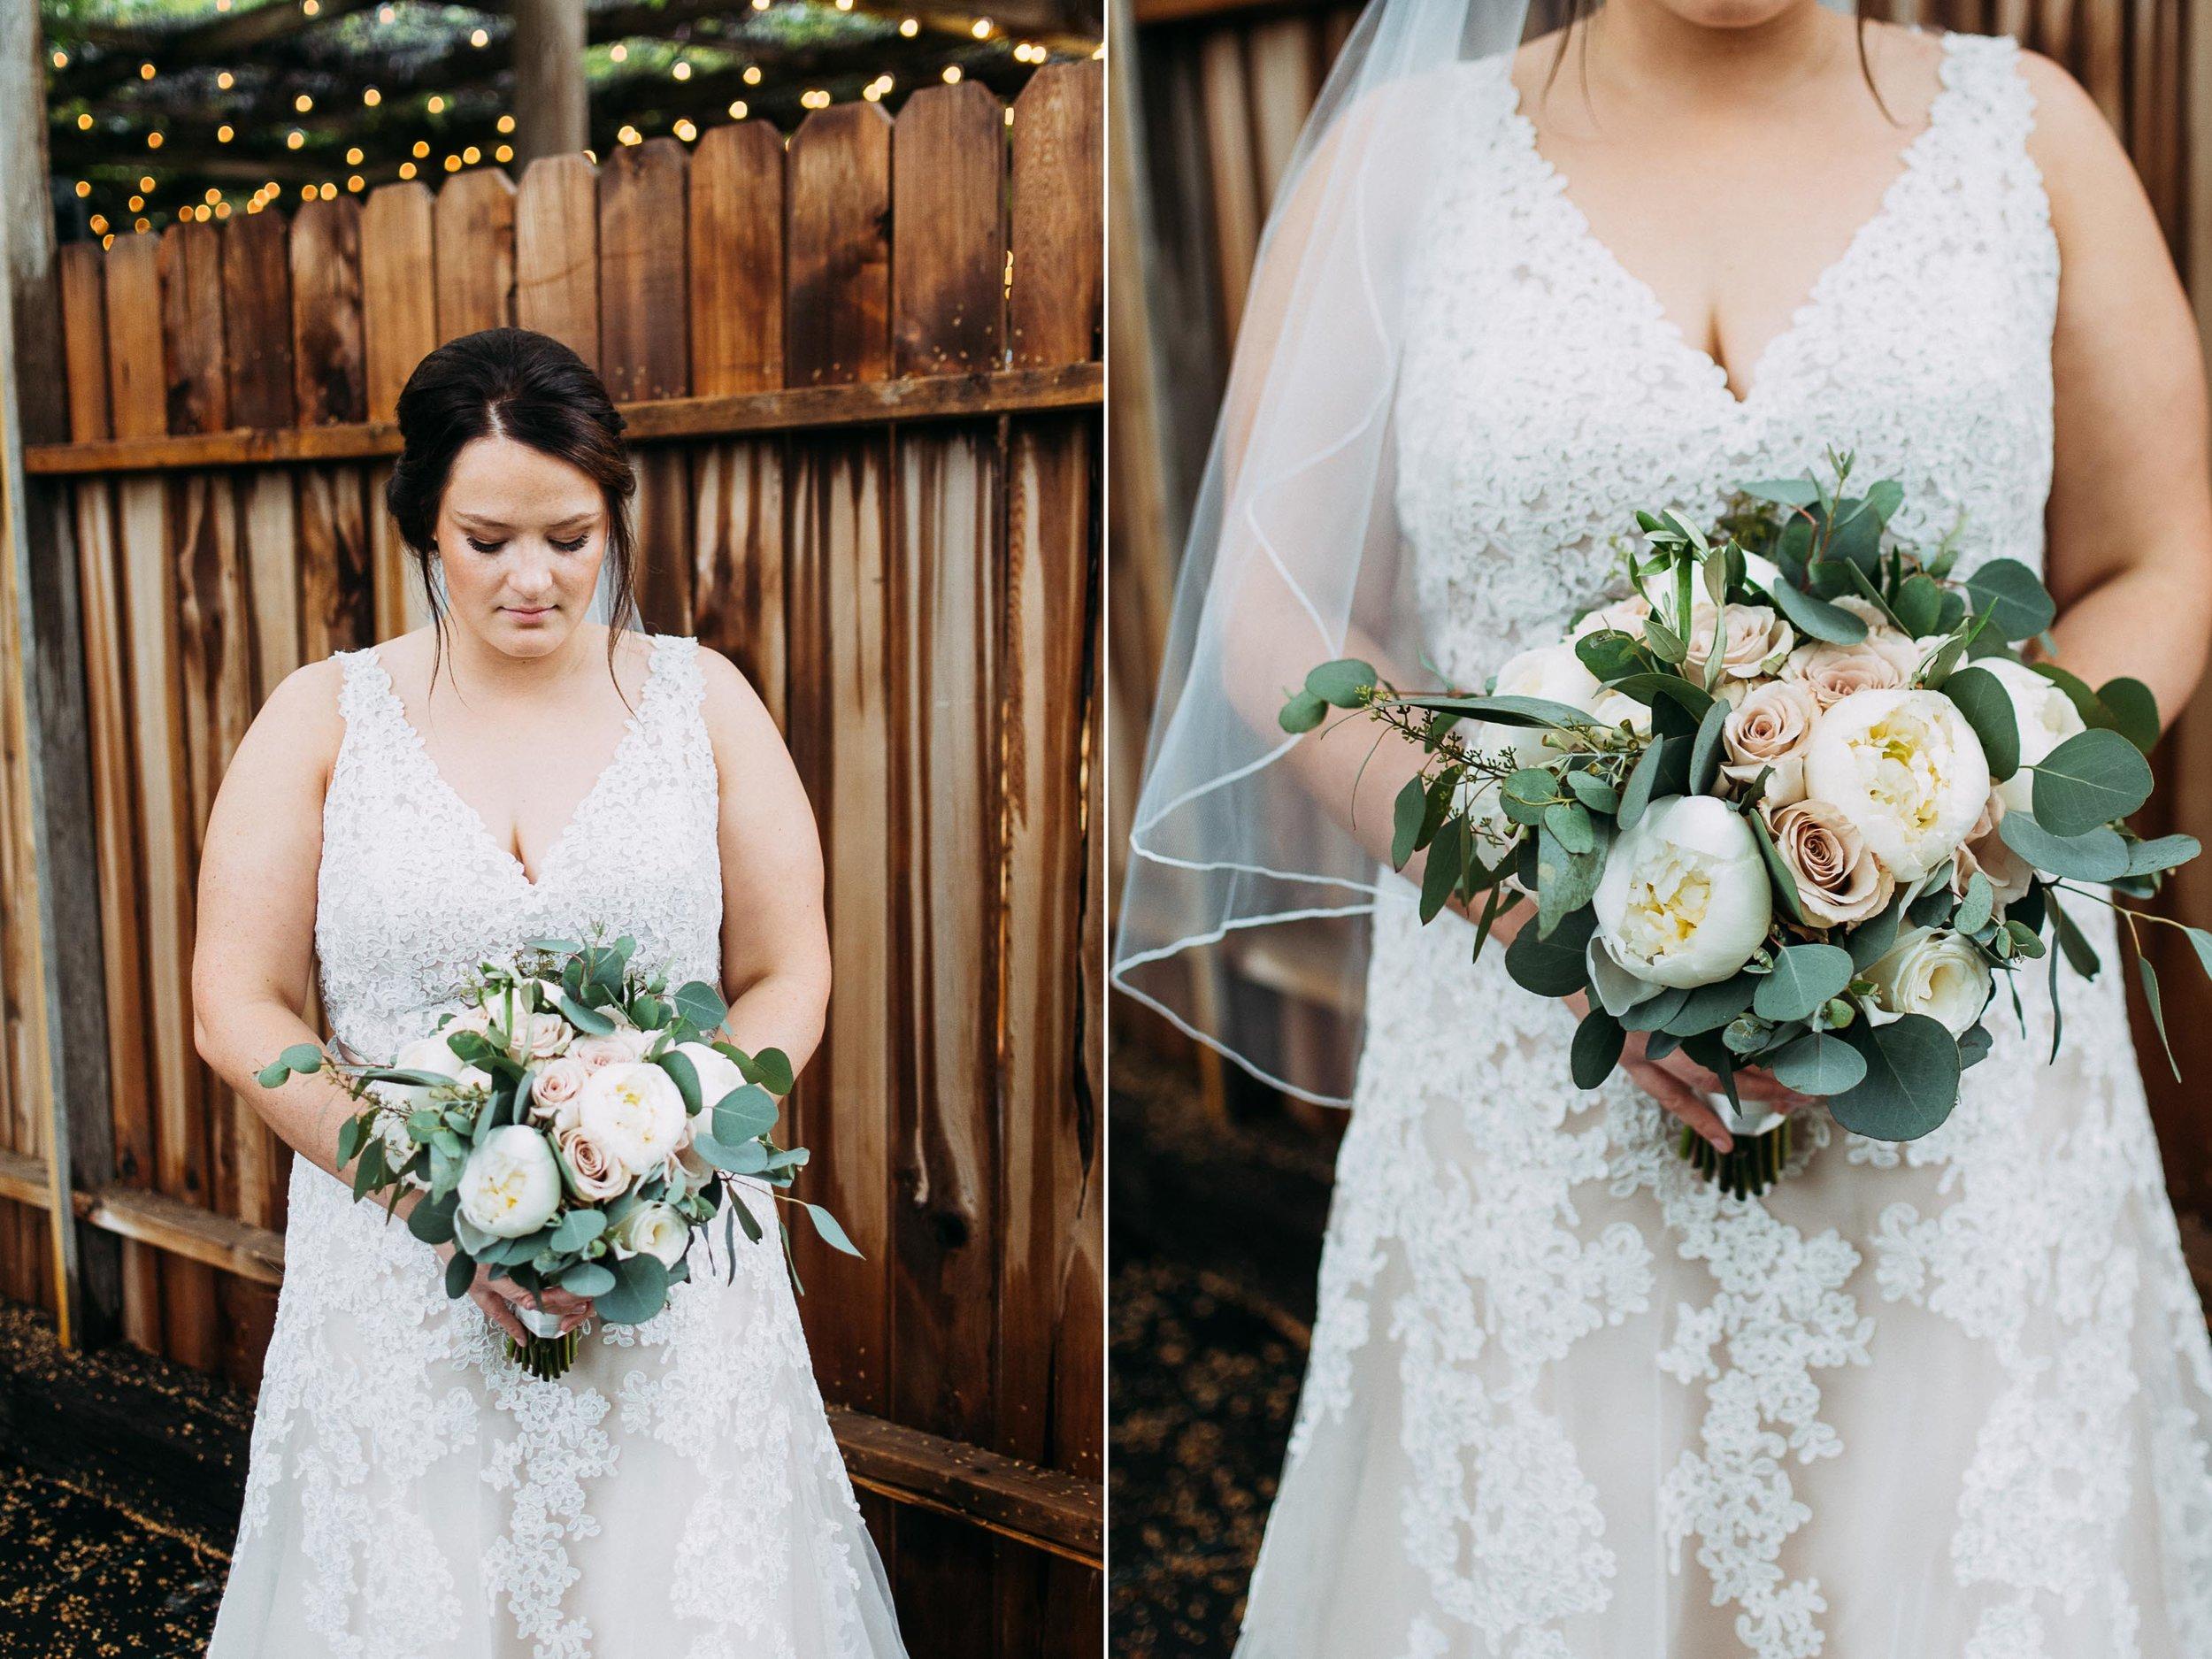 23-Jess_Jeremy_Minnesota_Wedding.jpg